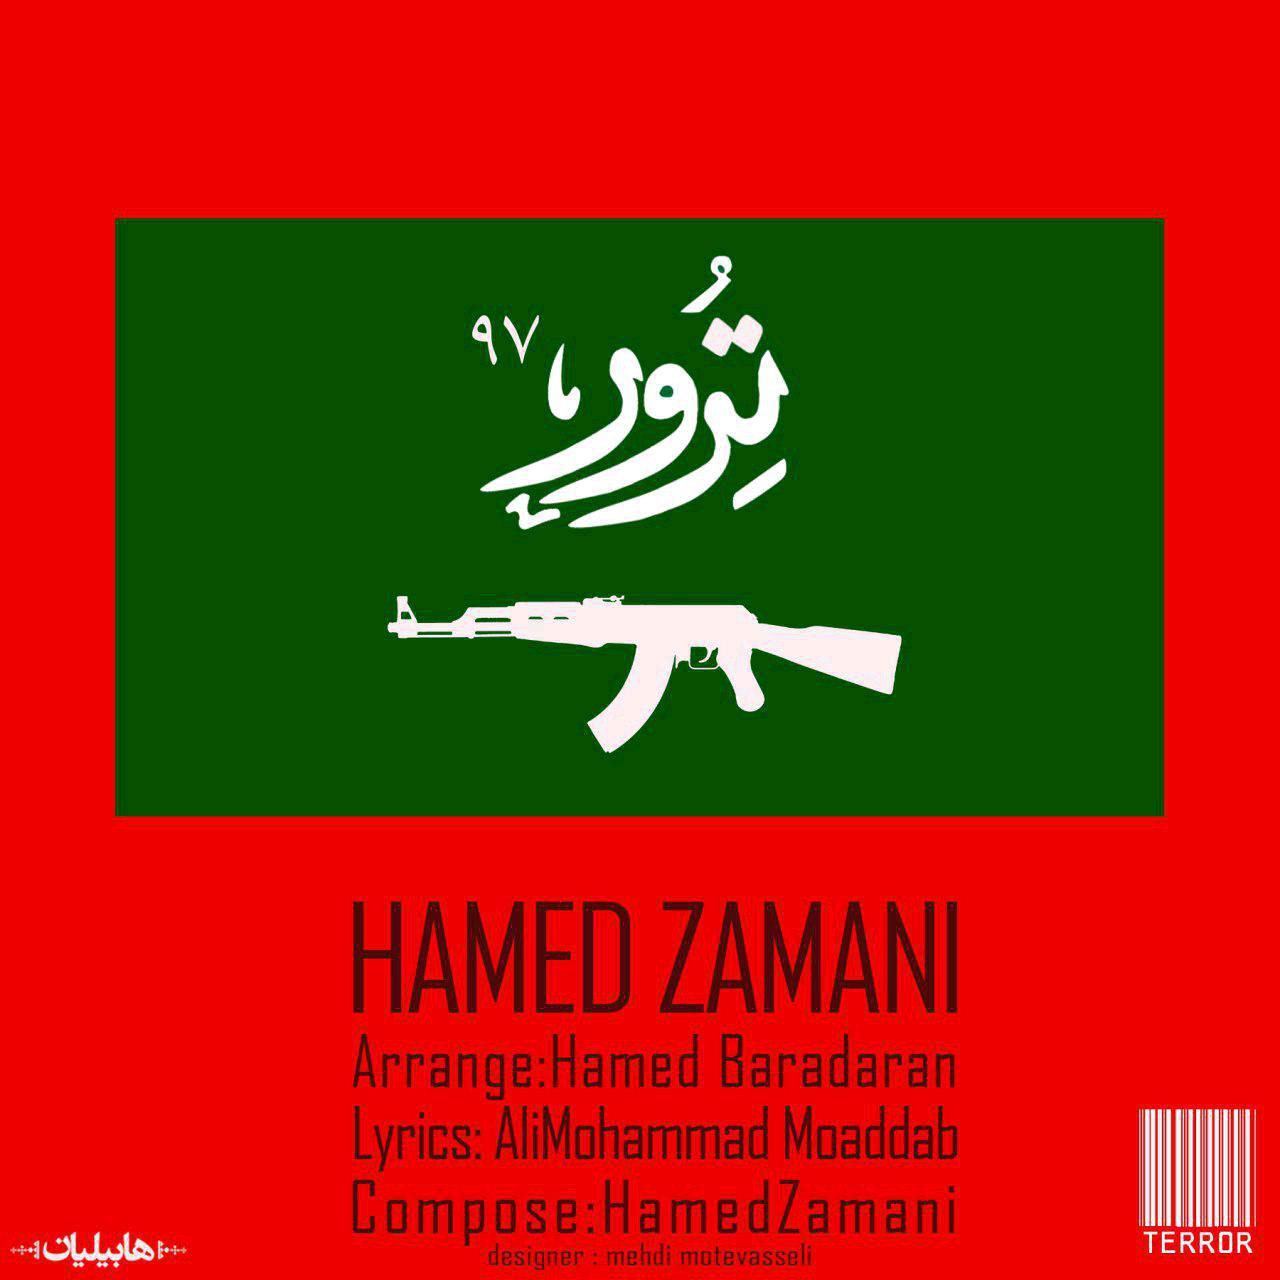 Hamed Zamani – Terror 97